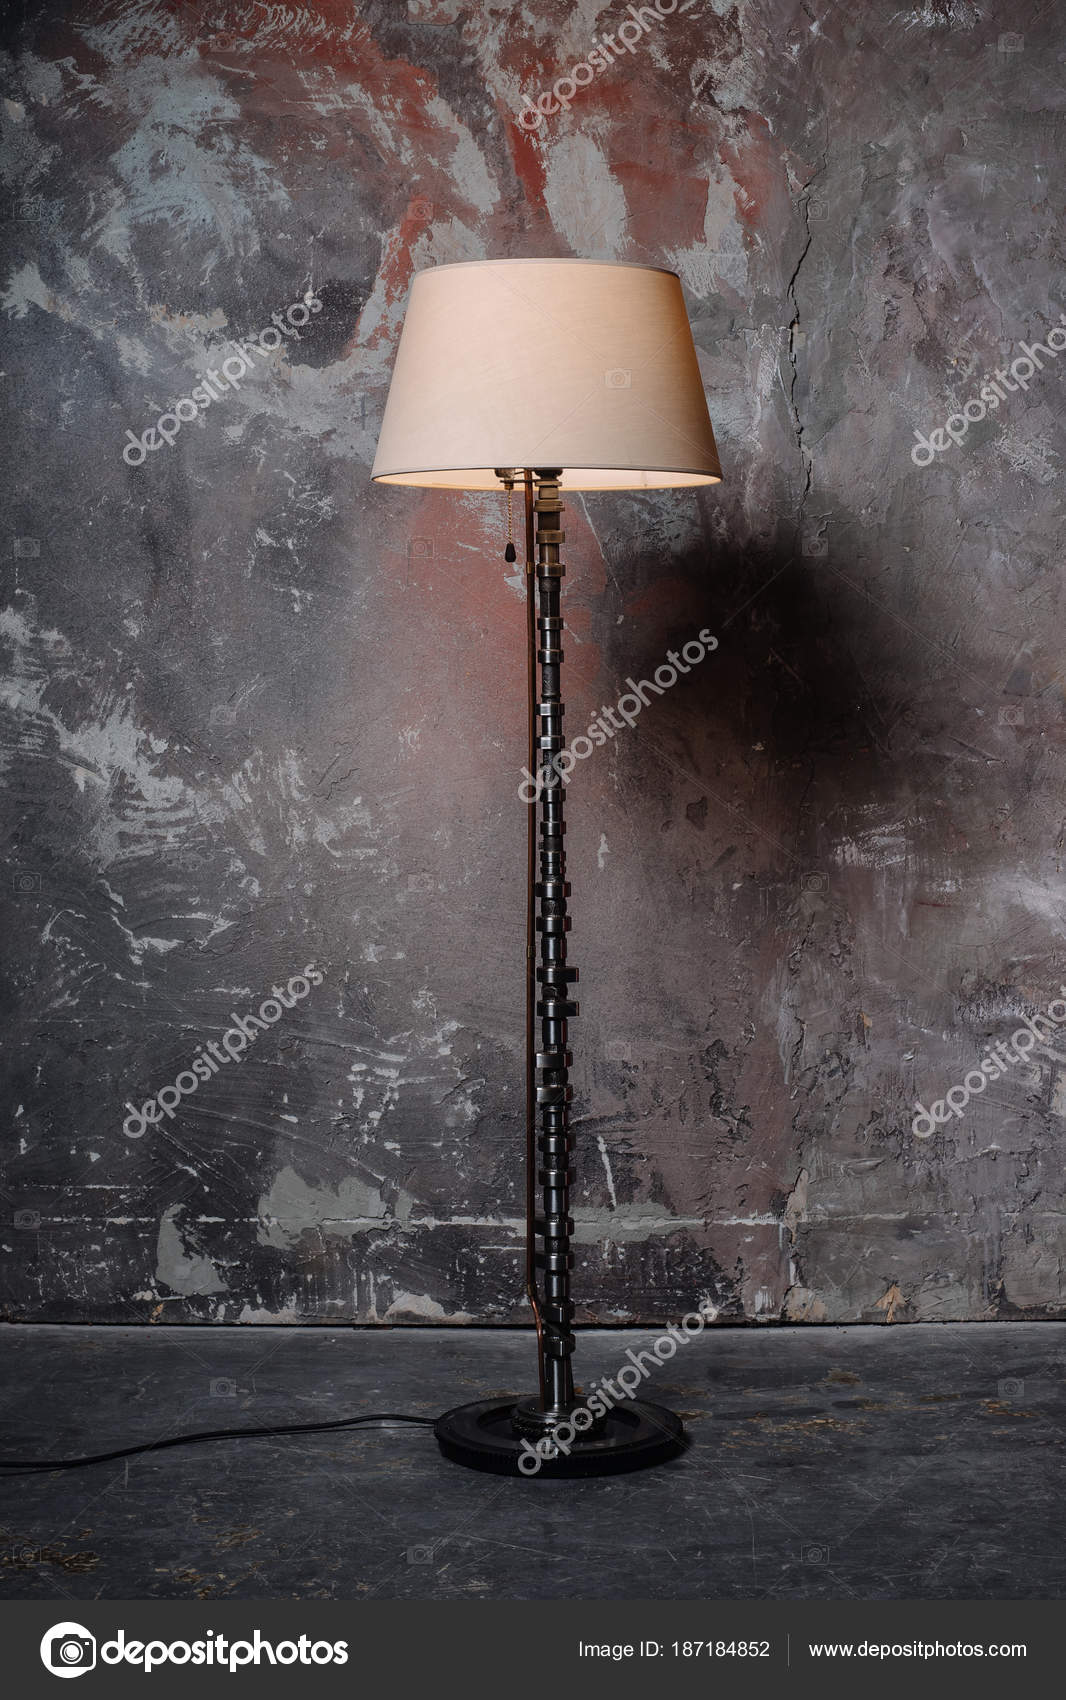 Floor lamp is handmade unusual lamp and chic gift made to order floor lamp is handmade unusual lamp and chic gift made to order from auto aloadofball Gallery